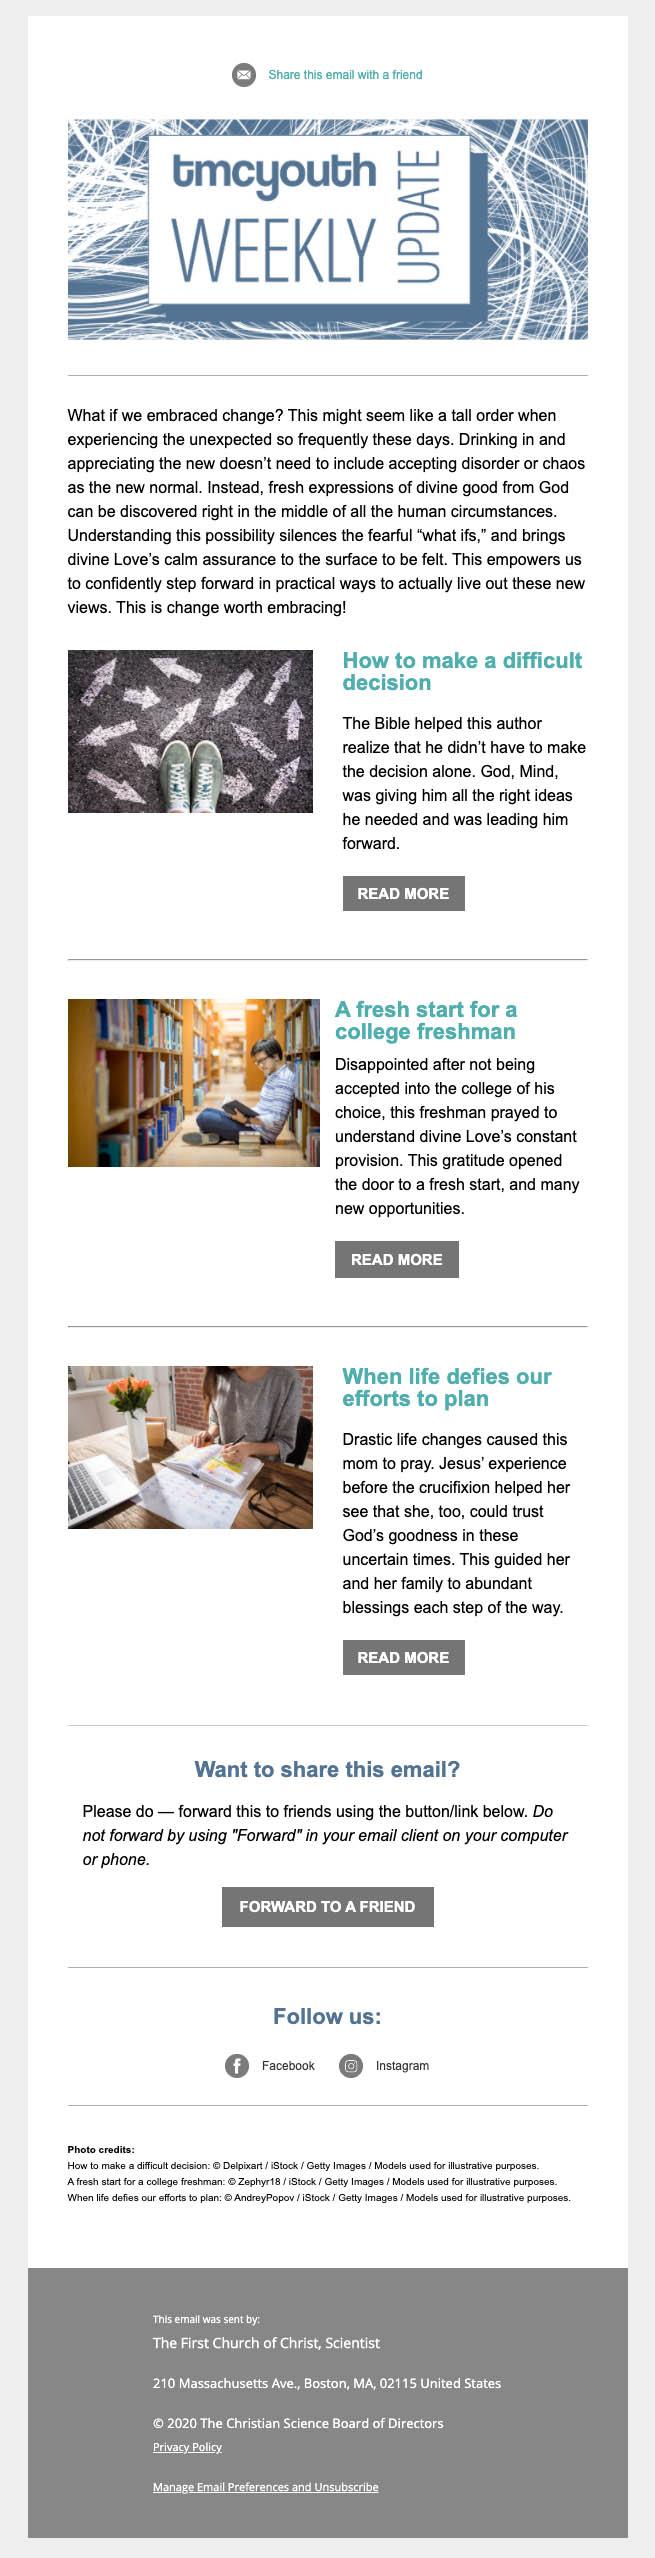 Sample of Weekly Update newsletter